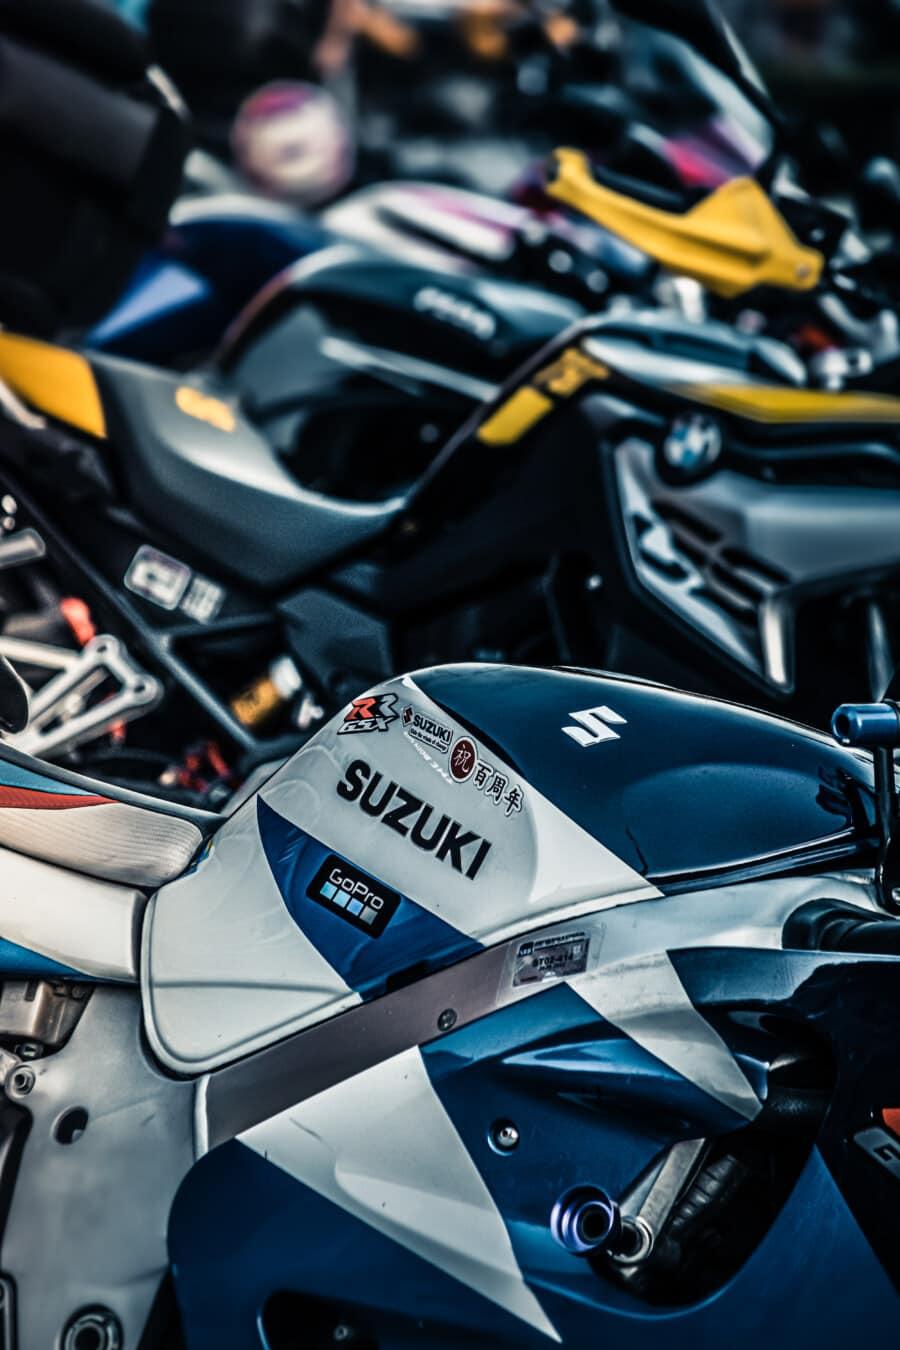 metallic, motorcycle, Suzuki, modern, parking lot, motorbike, vehicle, seat, fast, classic